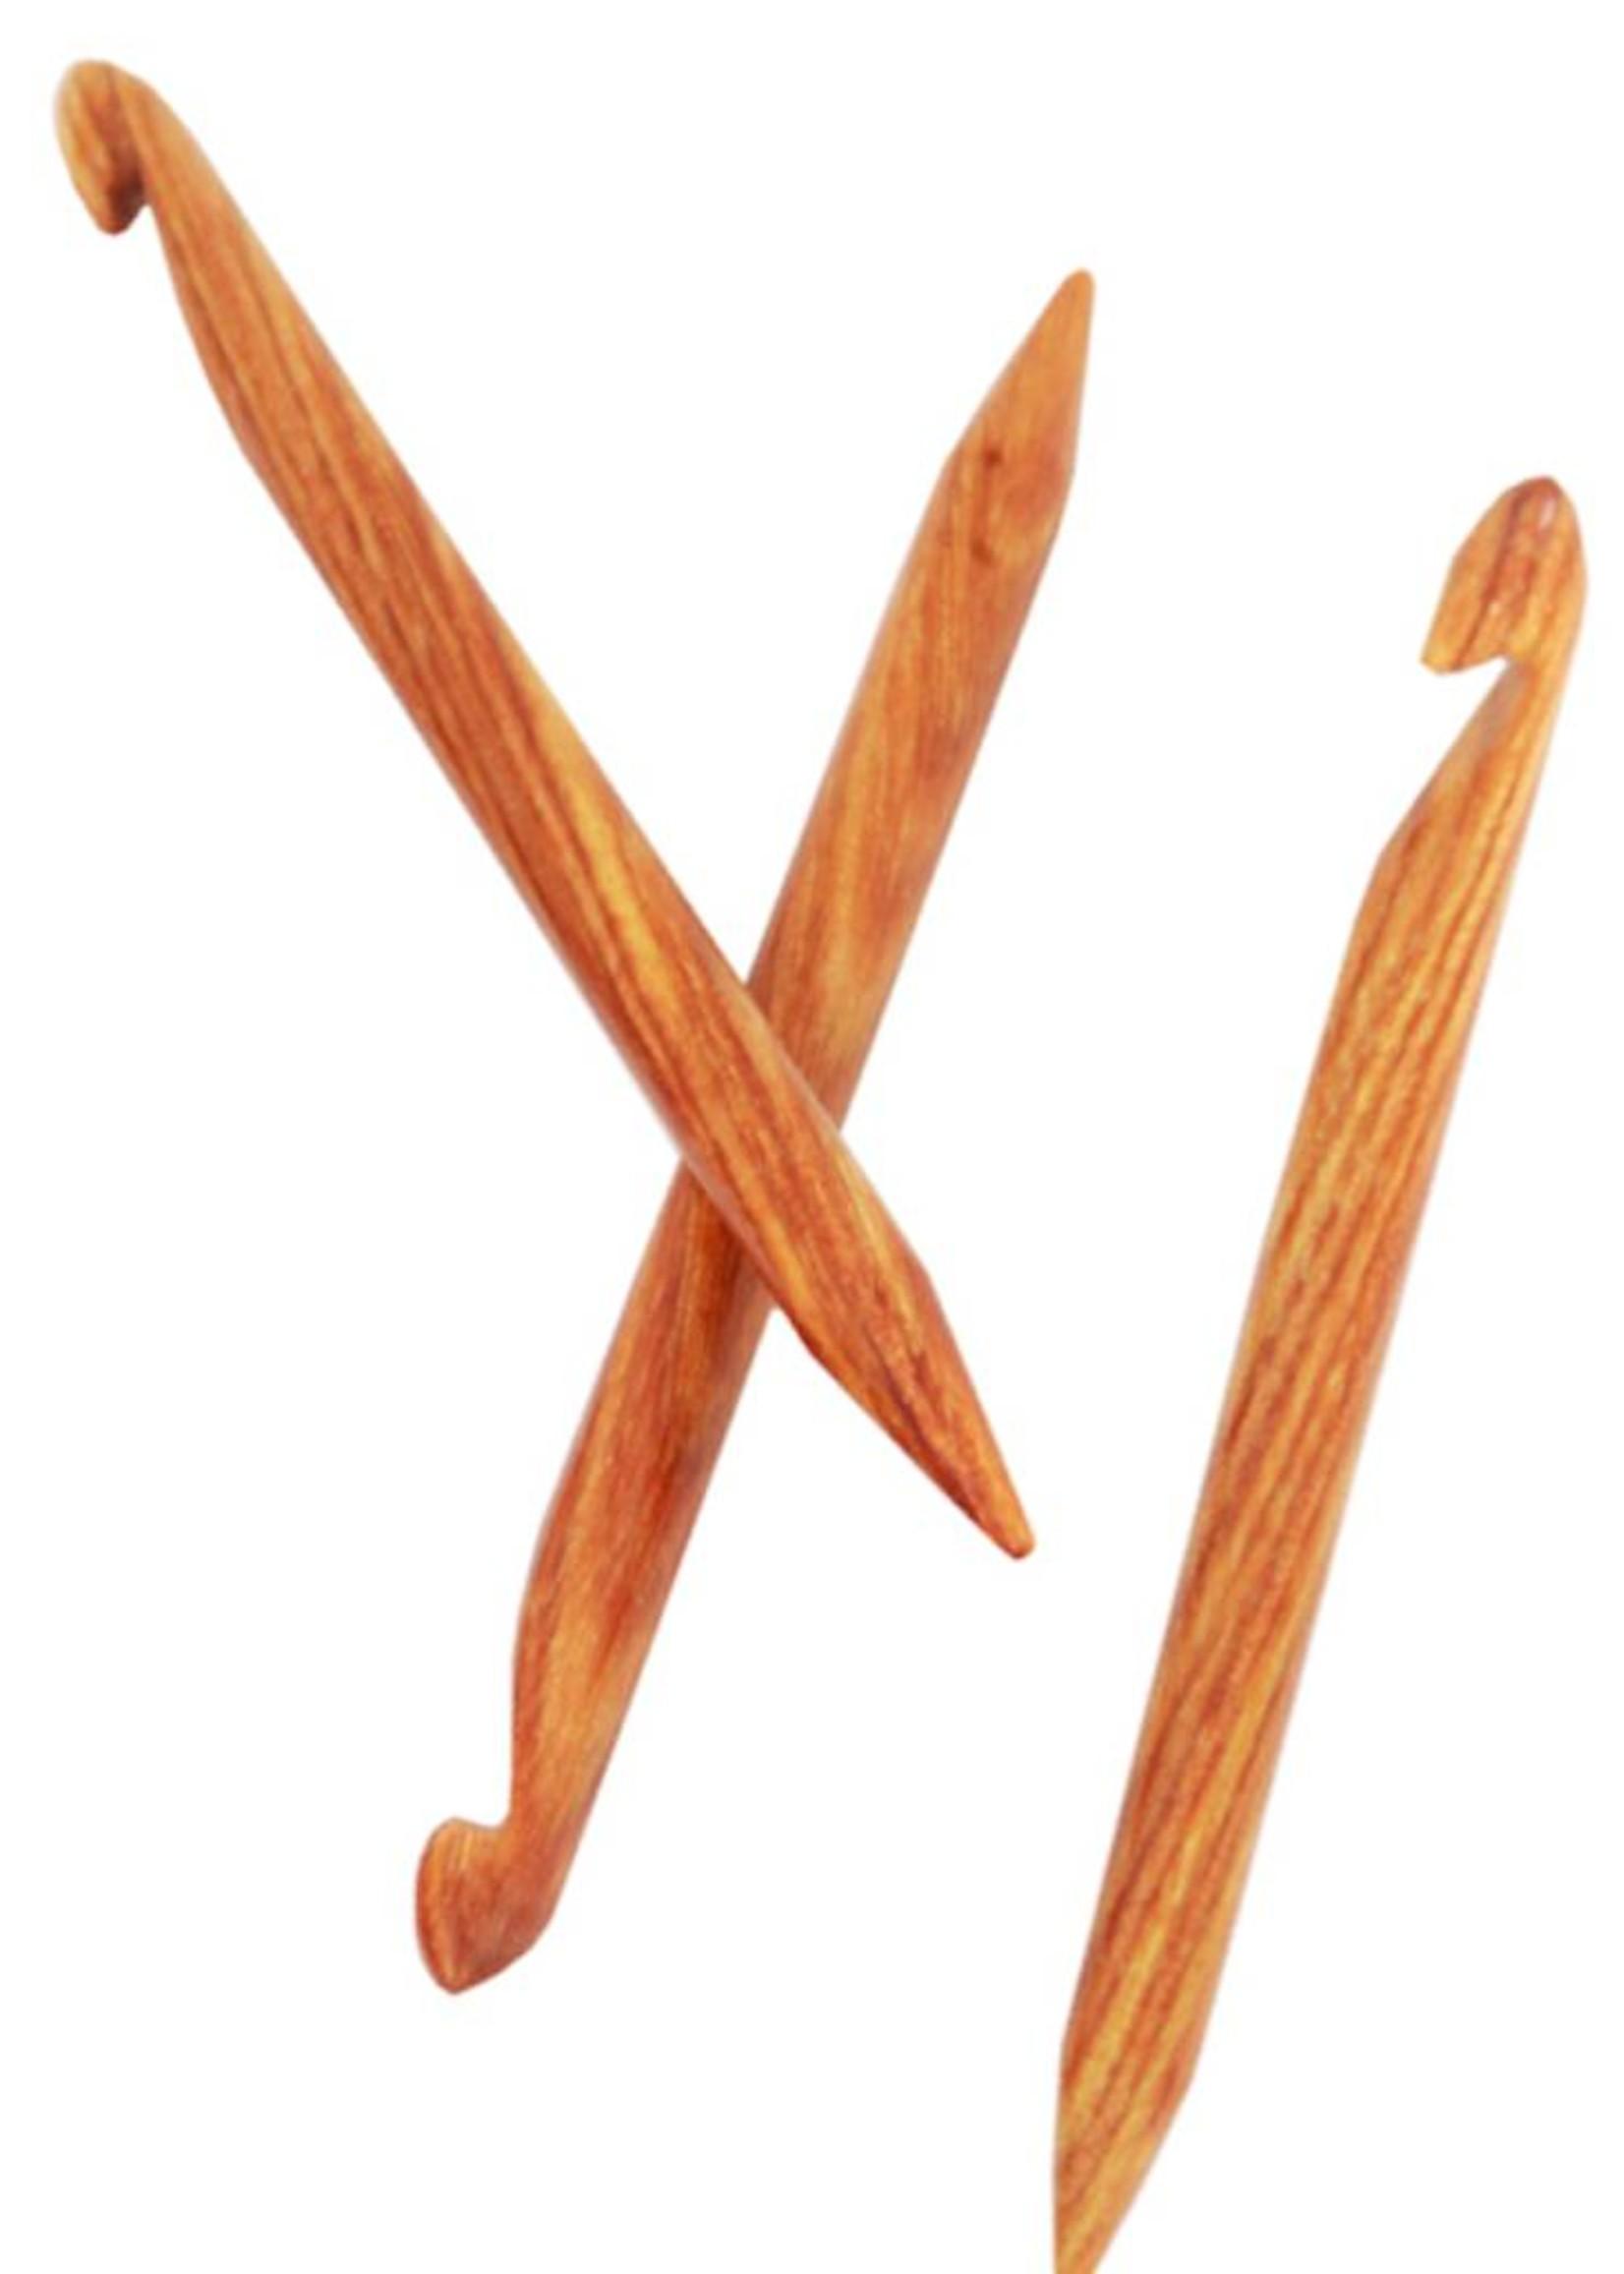 Knitter's Pride Repair Hooks